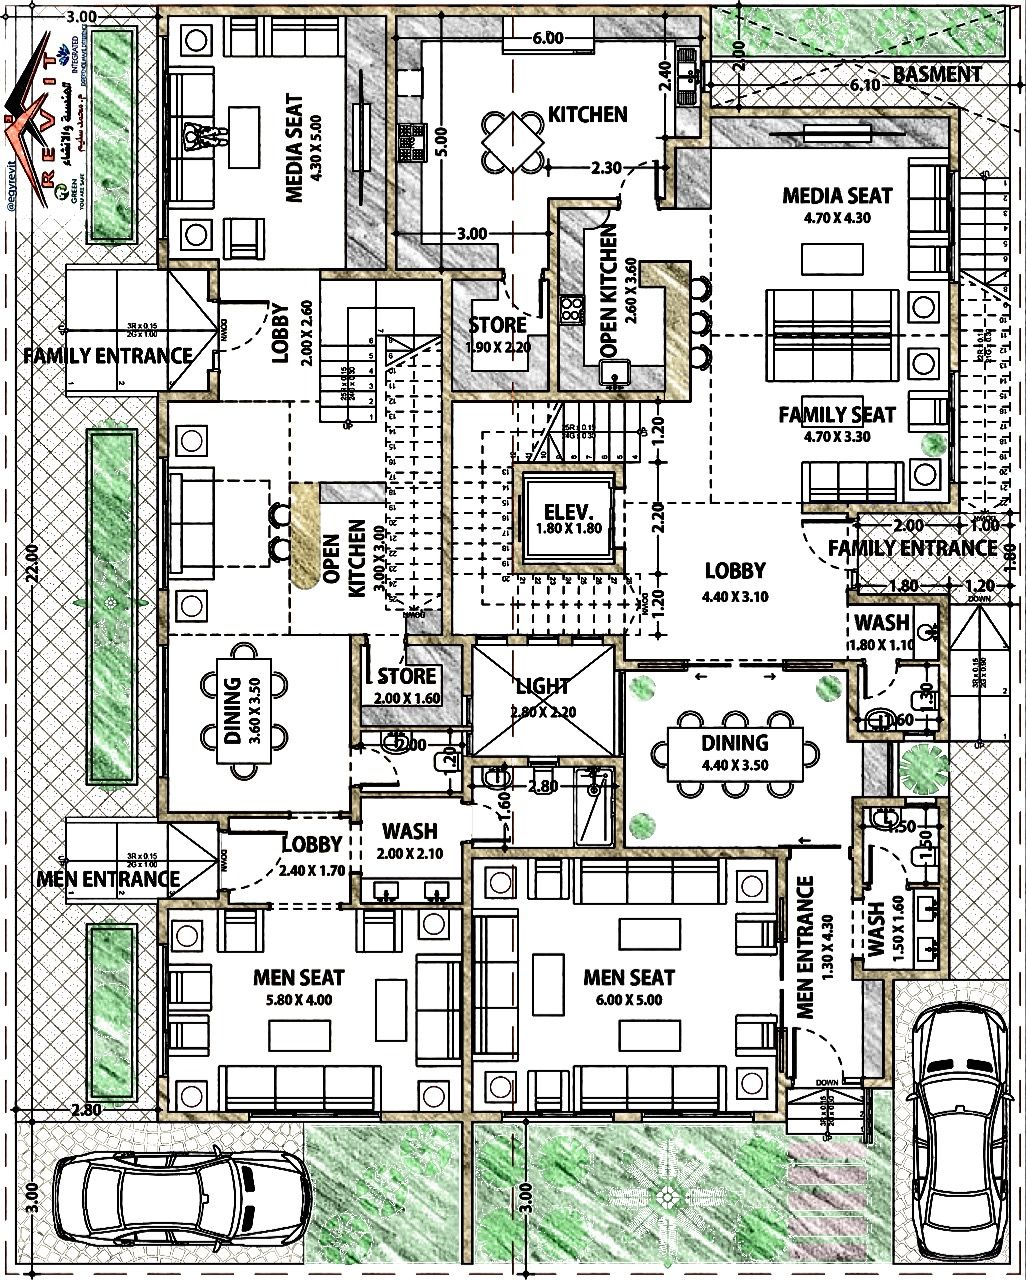 Arabia Villa مخطط فيلا للتواصل لعمل جميع التصاميم والديكور Twitter Egyrevit او الايميل Egyrevit Gmail Co Family House Plans 2bhk House Plan House Front Design